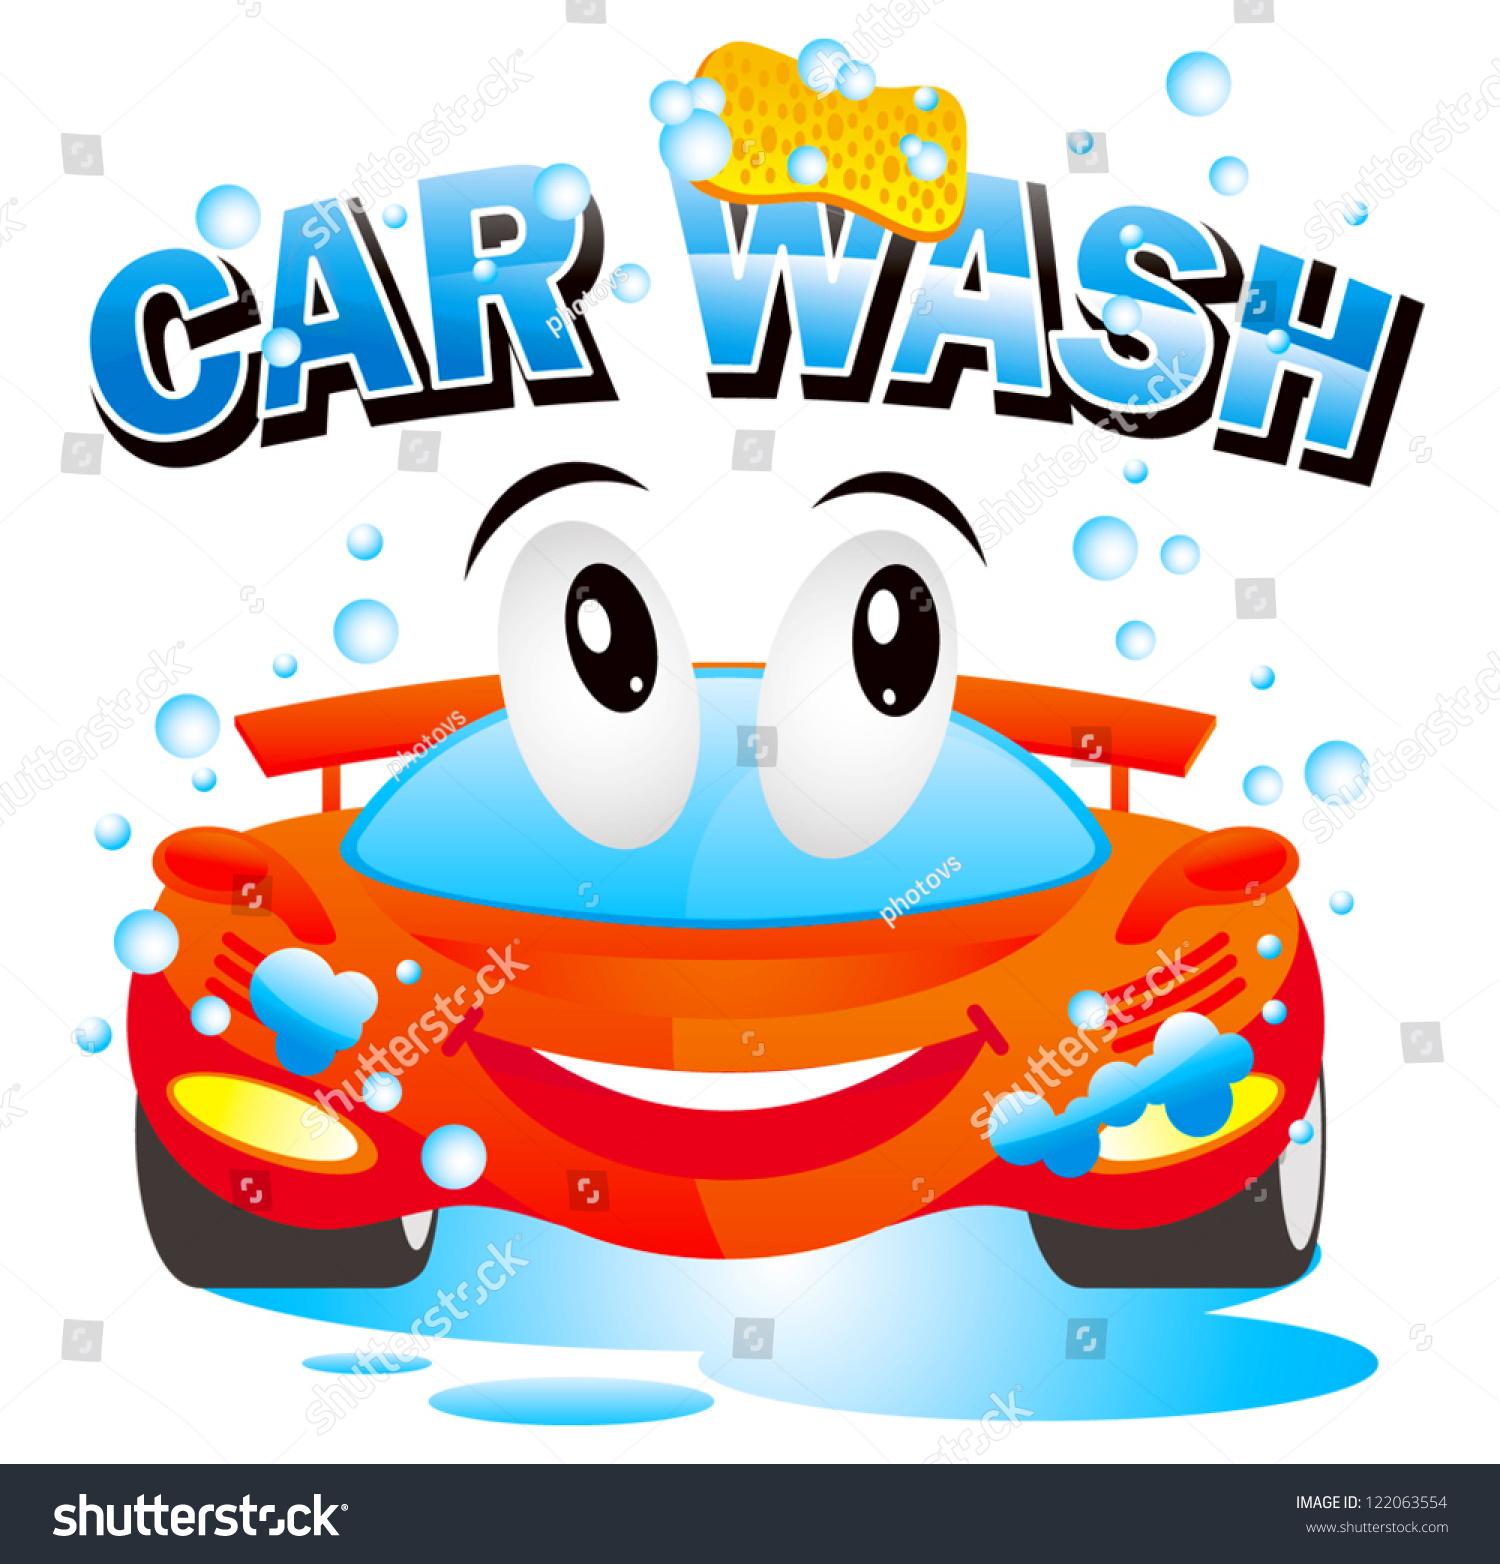 Stock Vector Car Wash